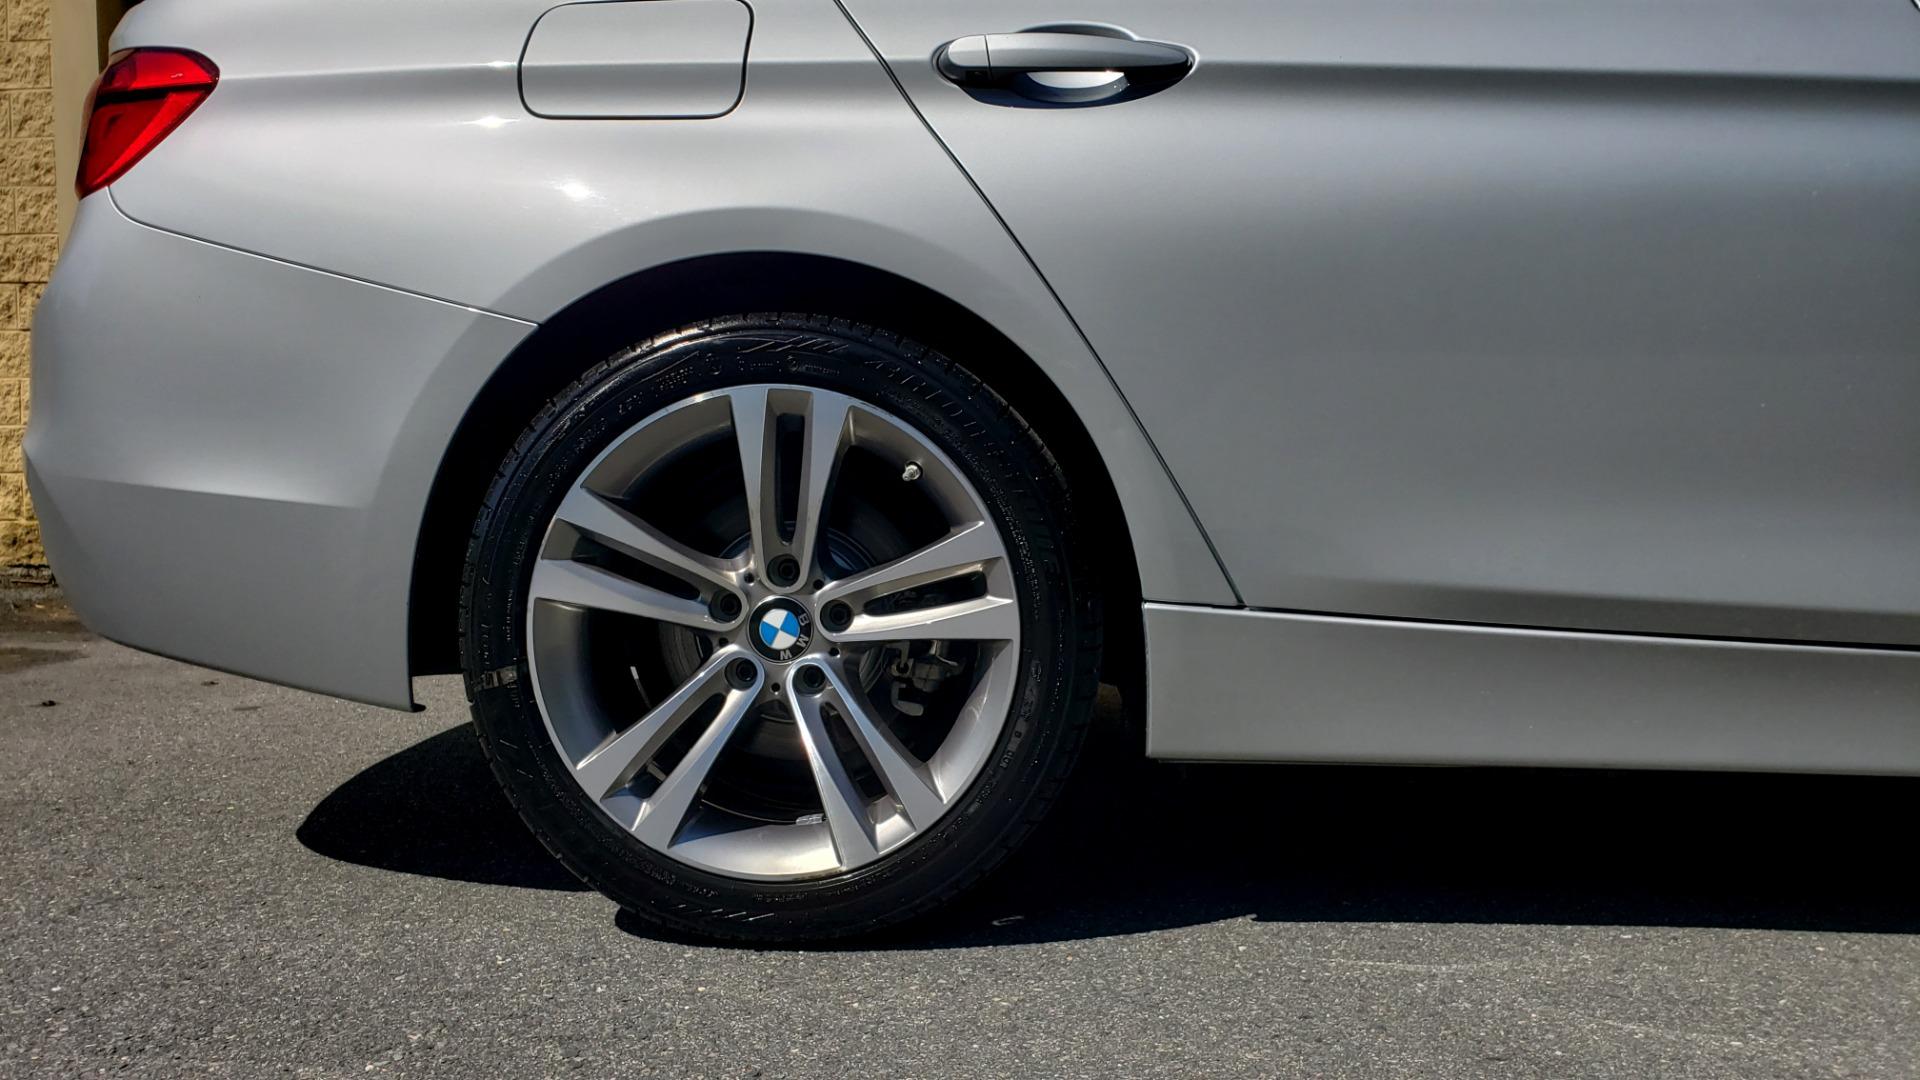 Used 2017 BMW 3 SERIES 330I SPORT SEDAN / DRVR ASST PKG / SUNROOF / REARVIEW for sale Sold at Formula Imports in Charlotte NC 28227 78